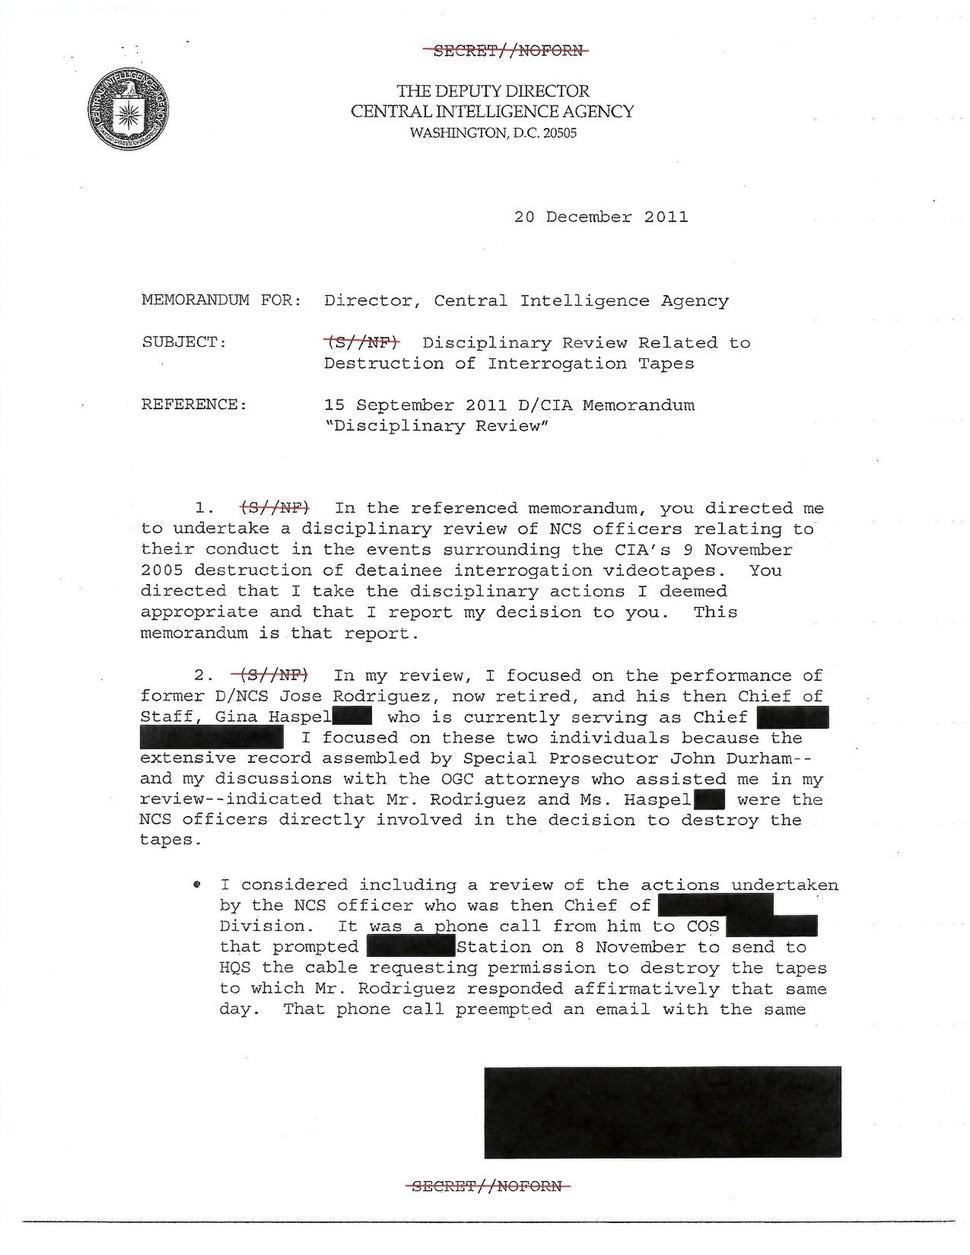 Memo on Gina Haspel Involvement in Destruction of Tapes.pdf